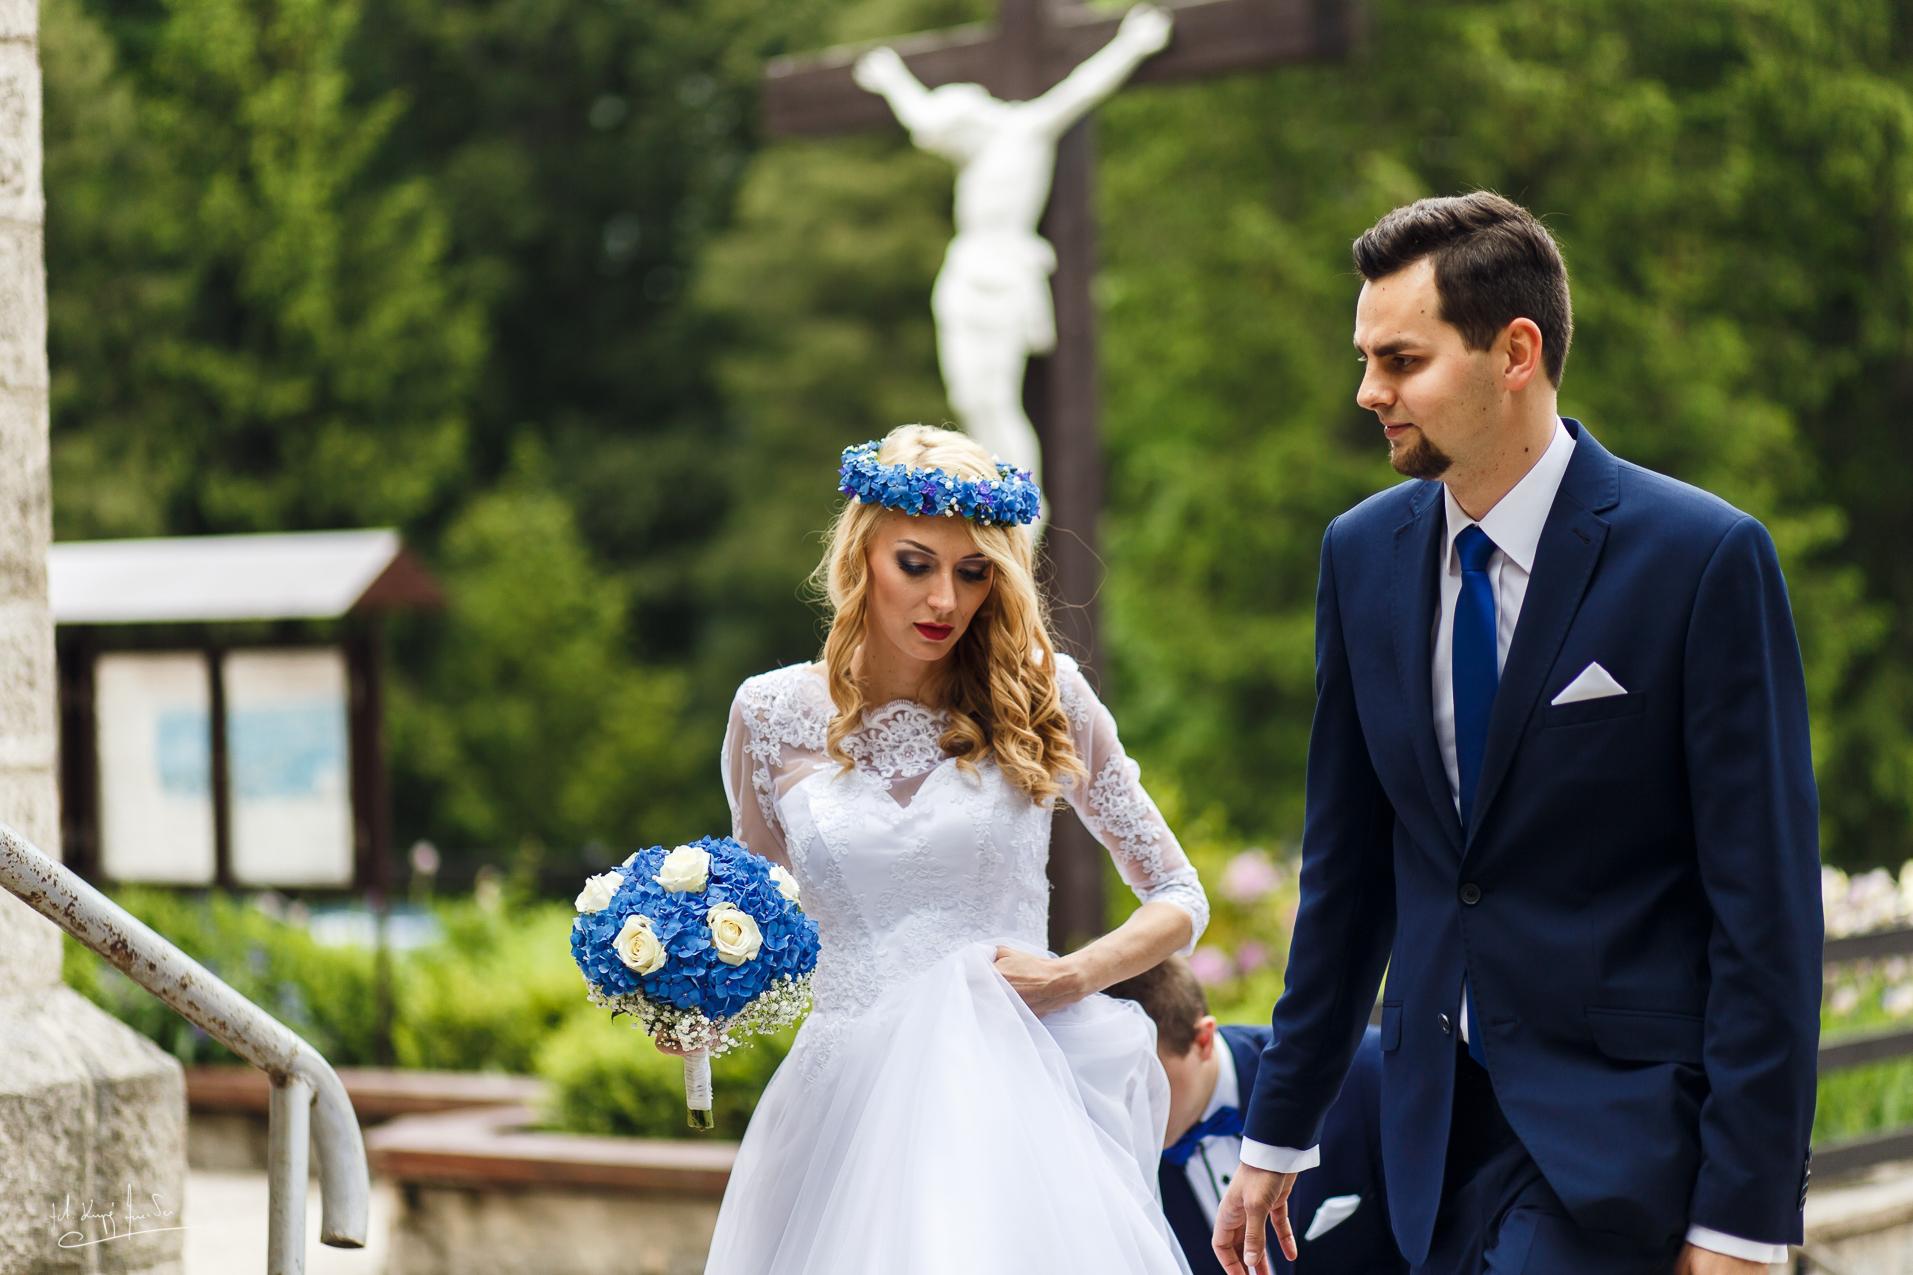 Ślub wesele szklarska poręba 18 Marta & Sławek